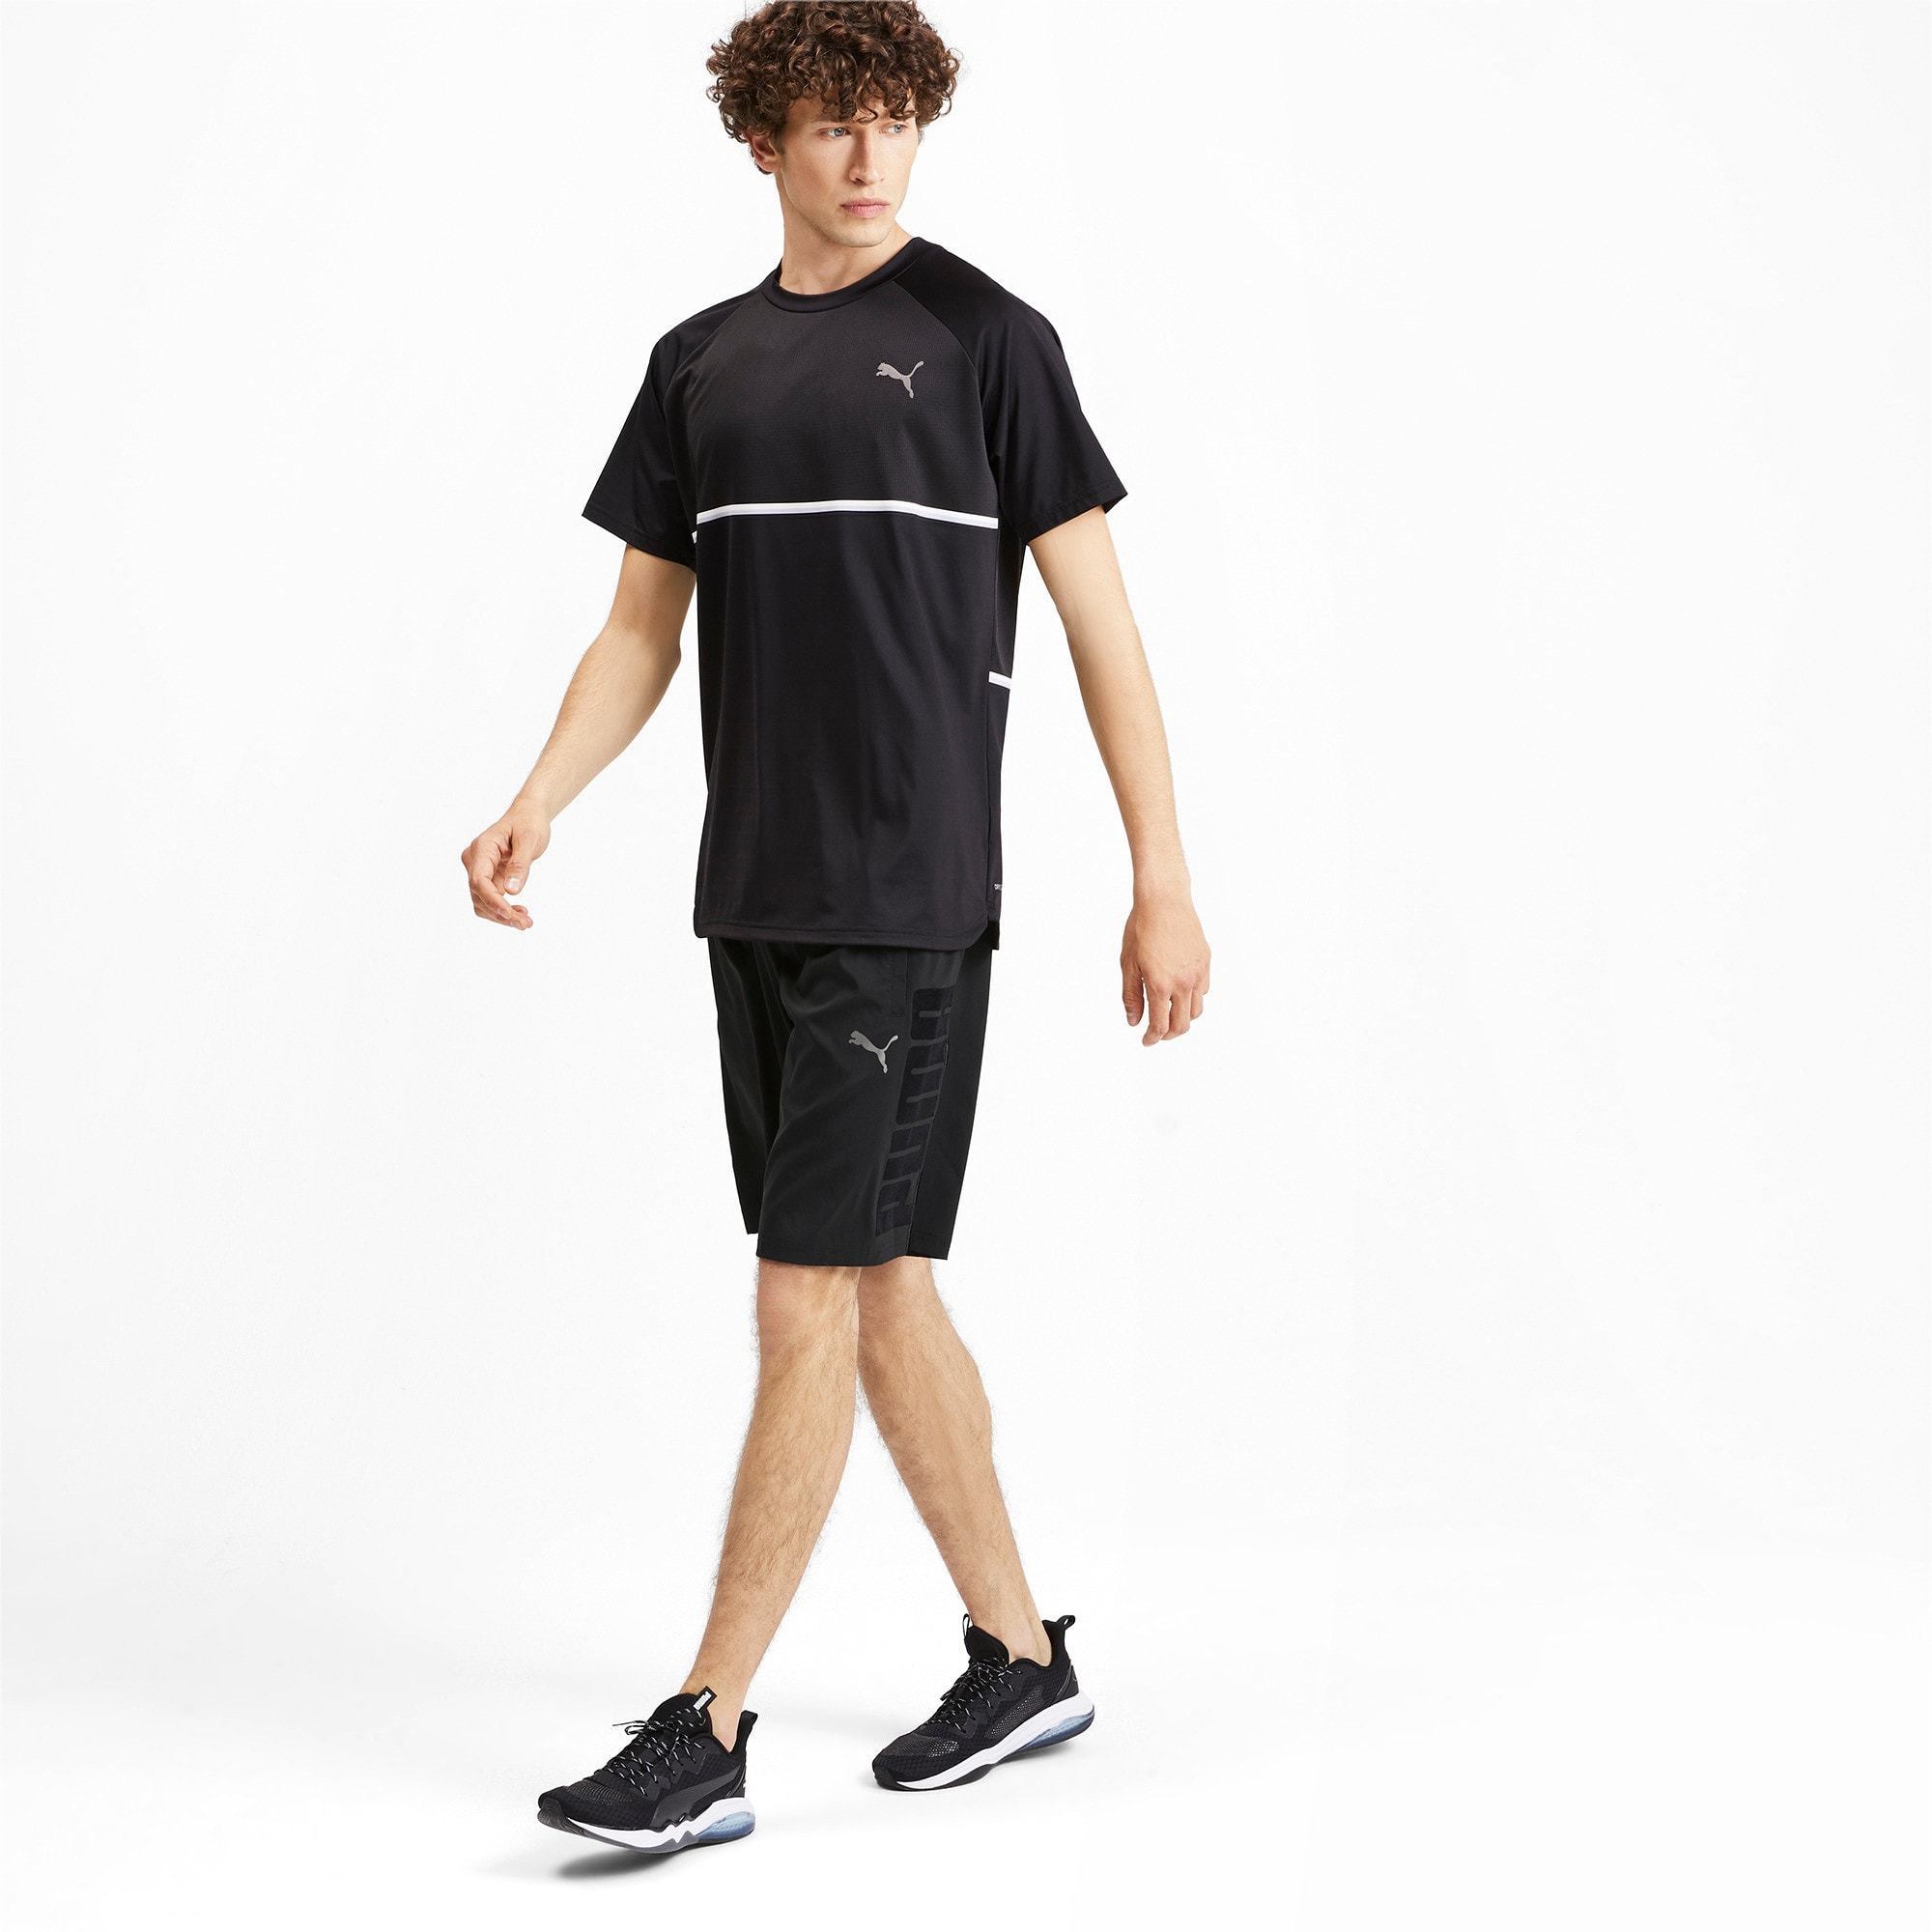 Thumbnail 3 of Power BND Men's Shorts, Puma Black, medium